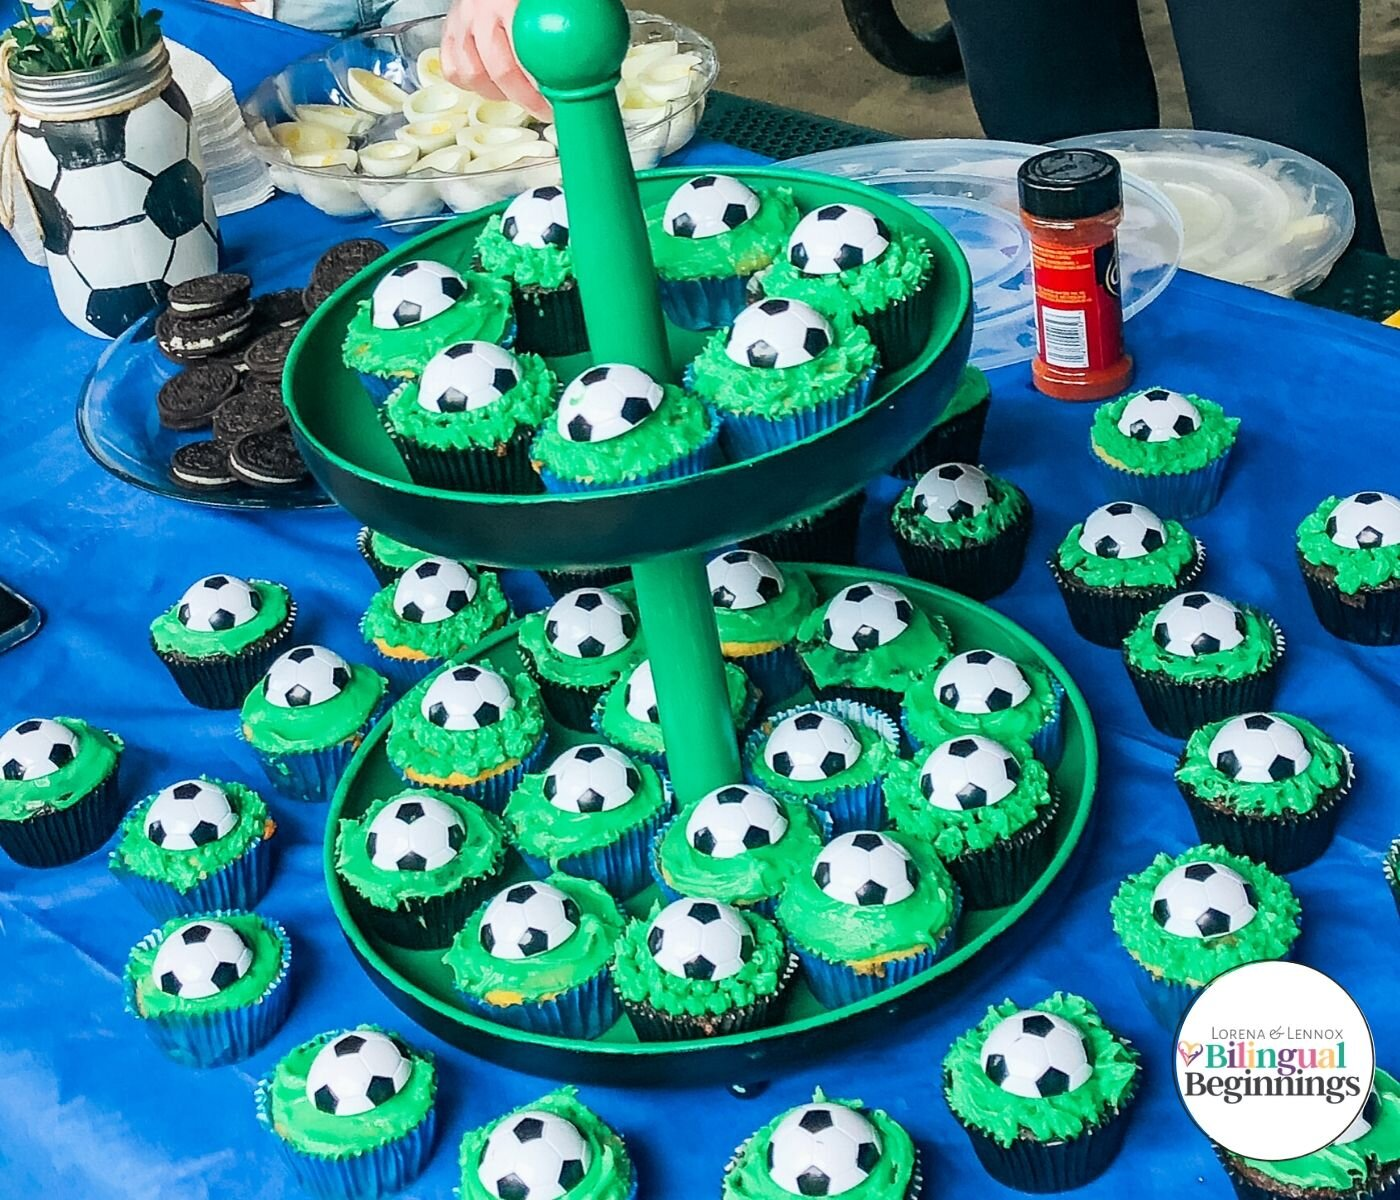 Soccer Birthday Party Ideas Bilingual Beginnings